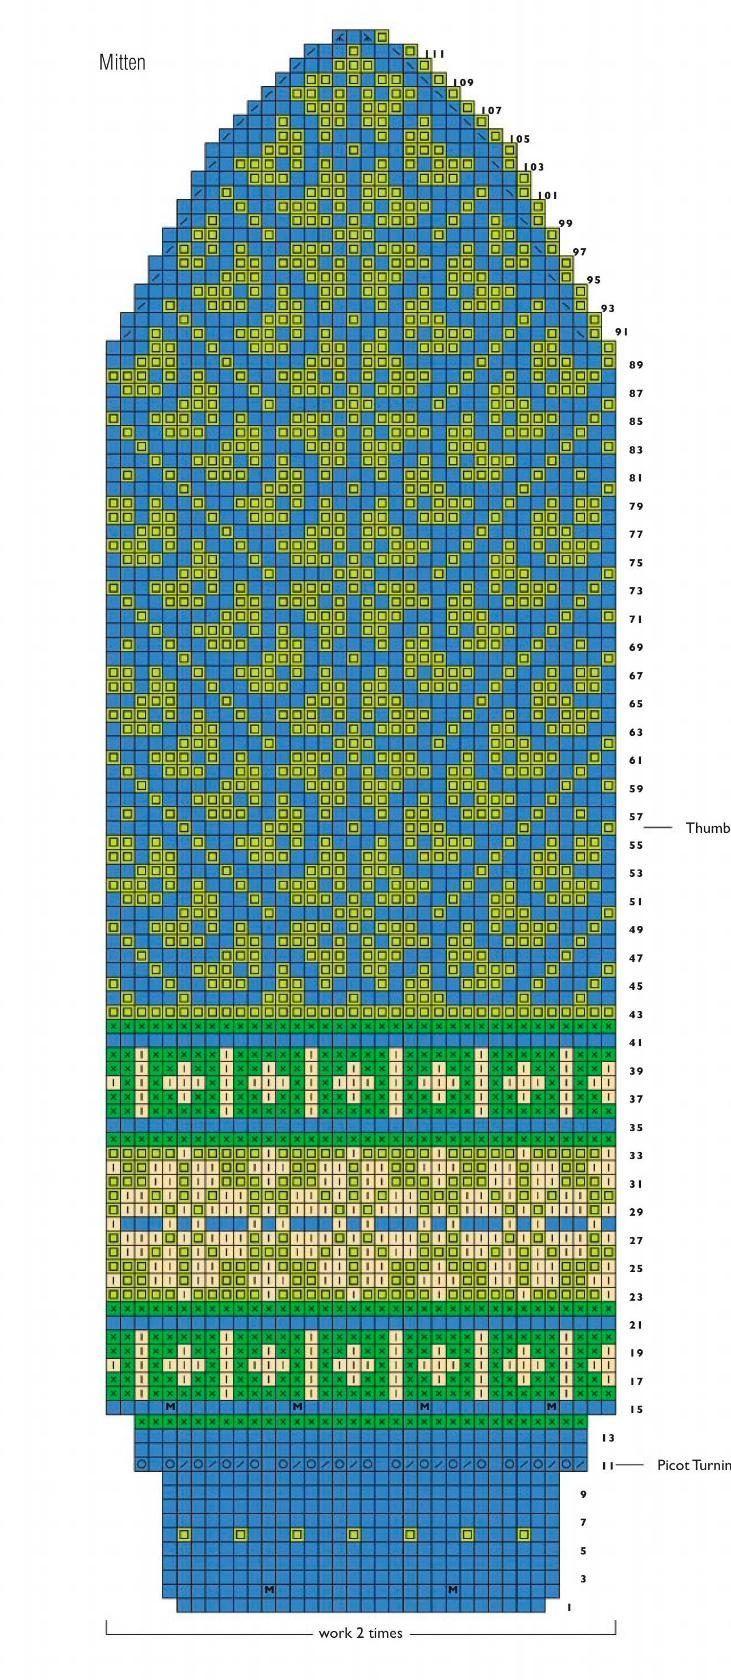 093a6bbf6c3823114b0b0b37c8691674.jpg (731×1680)